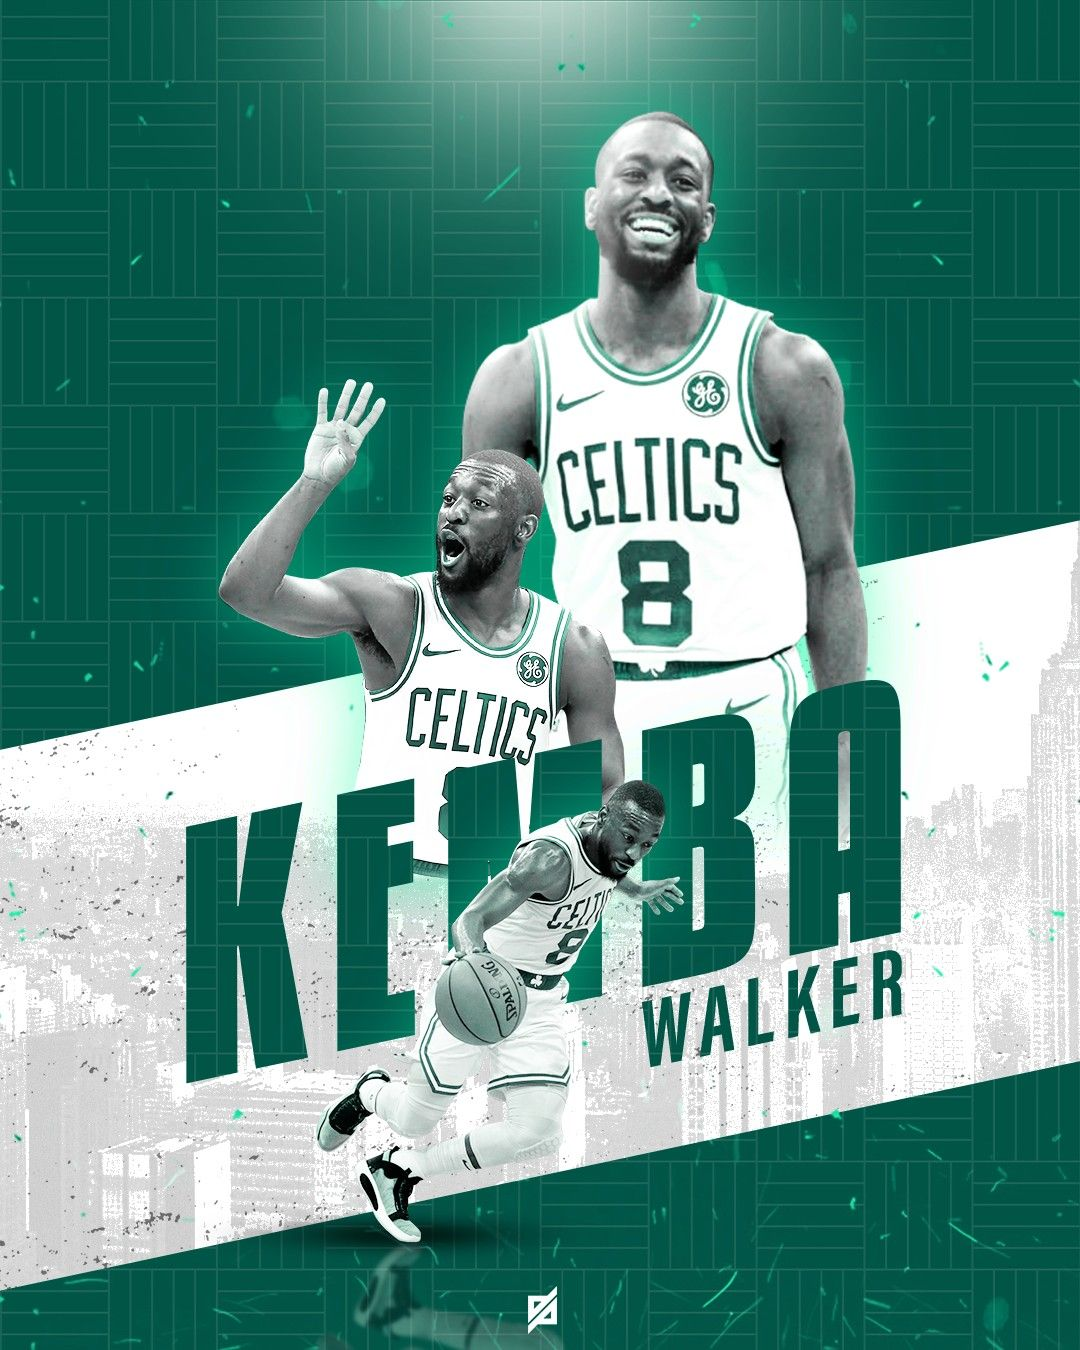 Cardiac Kemba Walker Basketball Posters Nba Players